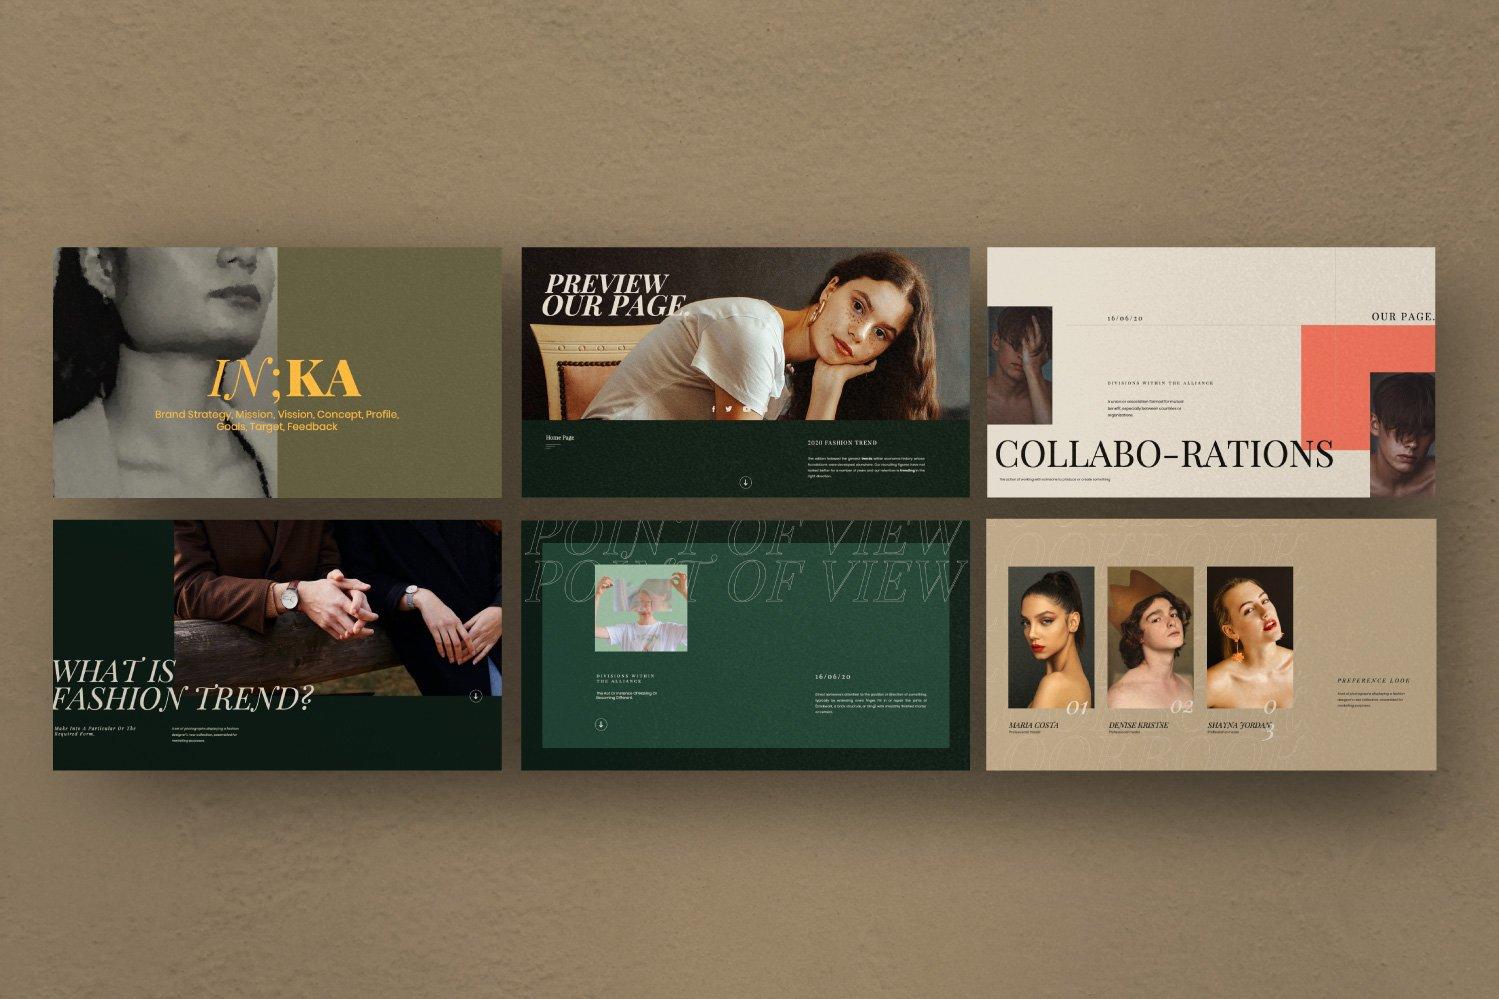 时尚创意服装摄影作品集幻灯片设计模板 Iconic – Fashion Lookbook PowerPoint插图(3)